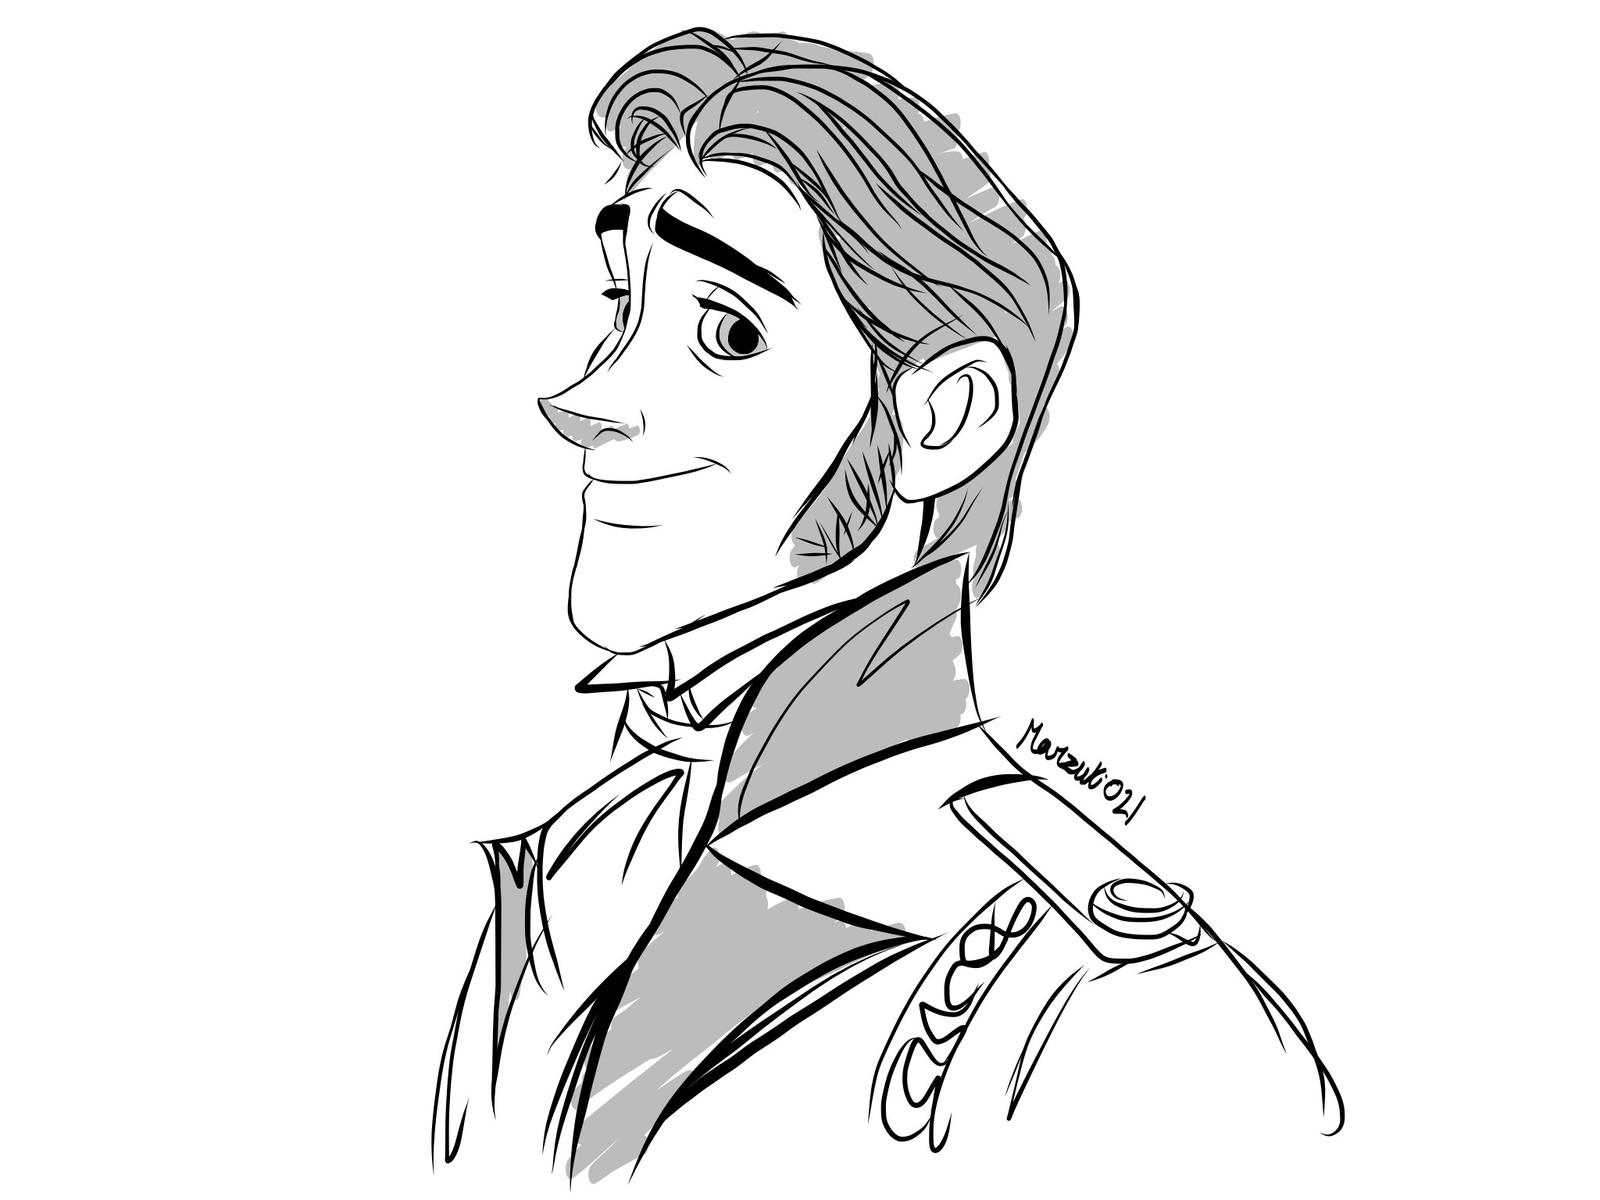 Prince hans frozen coloring pages - Prince Hans